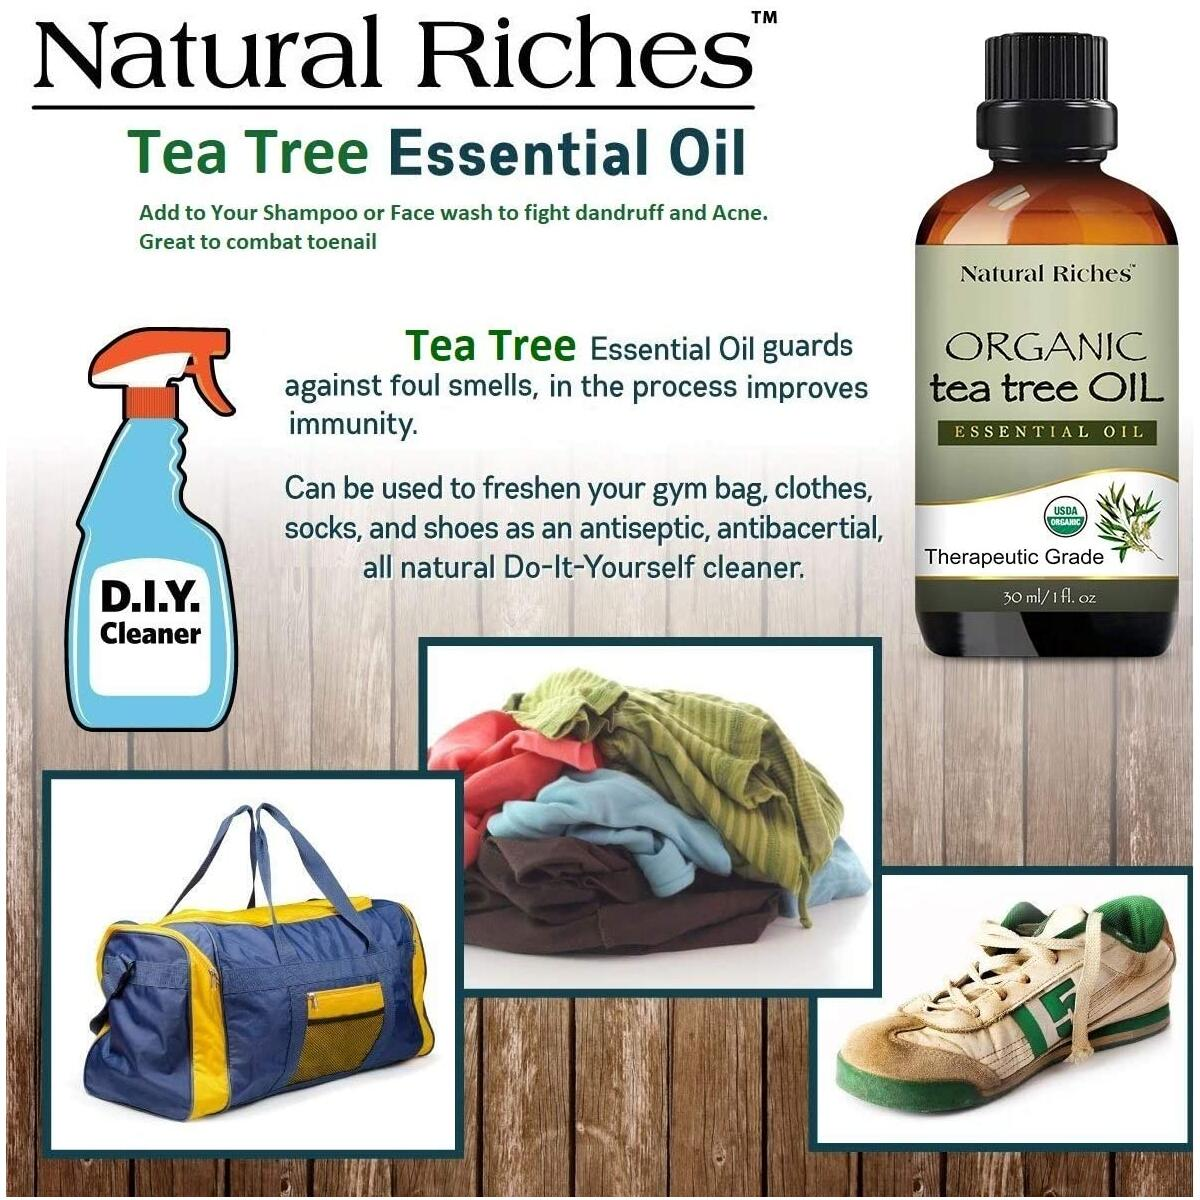 Natural Riches Organic Tea Tree Oil - Melaleuca Alternifolia Oils Therapeutic Grade Natural Pure Tea Tree Essential Oil for Acne, Hair, Skin and Scalp from Natural Riches - 30ml